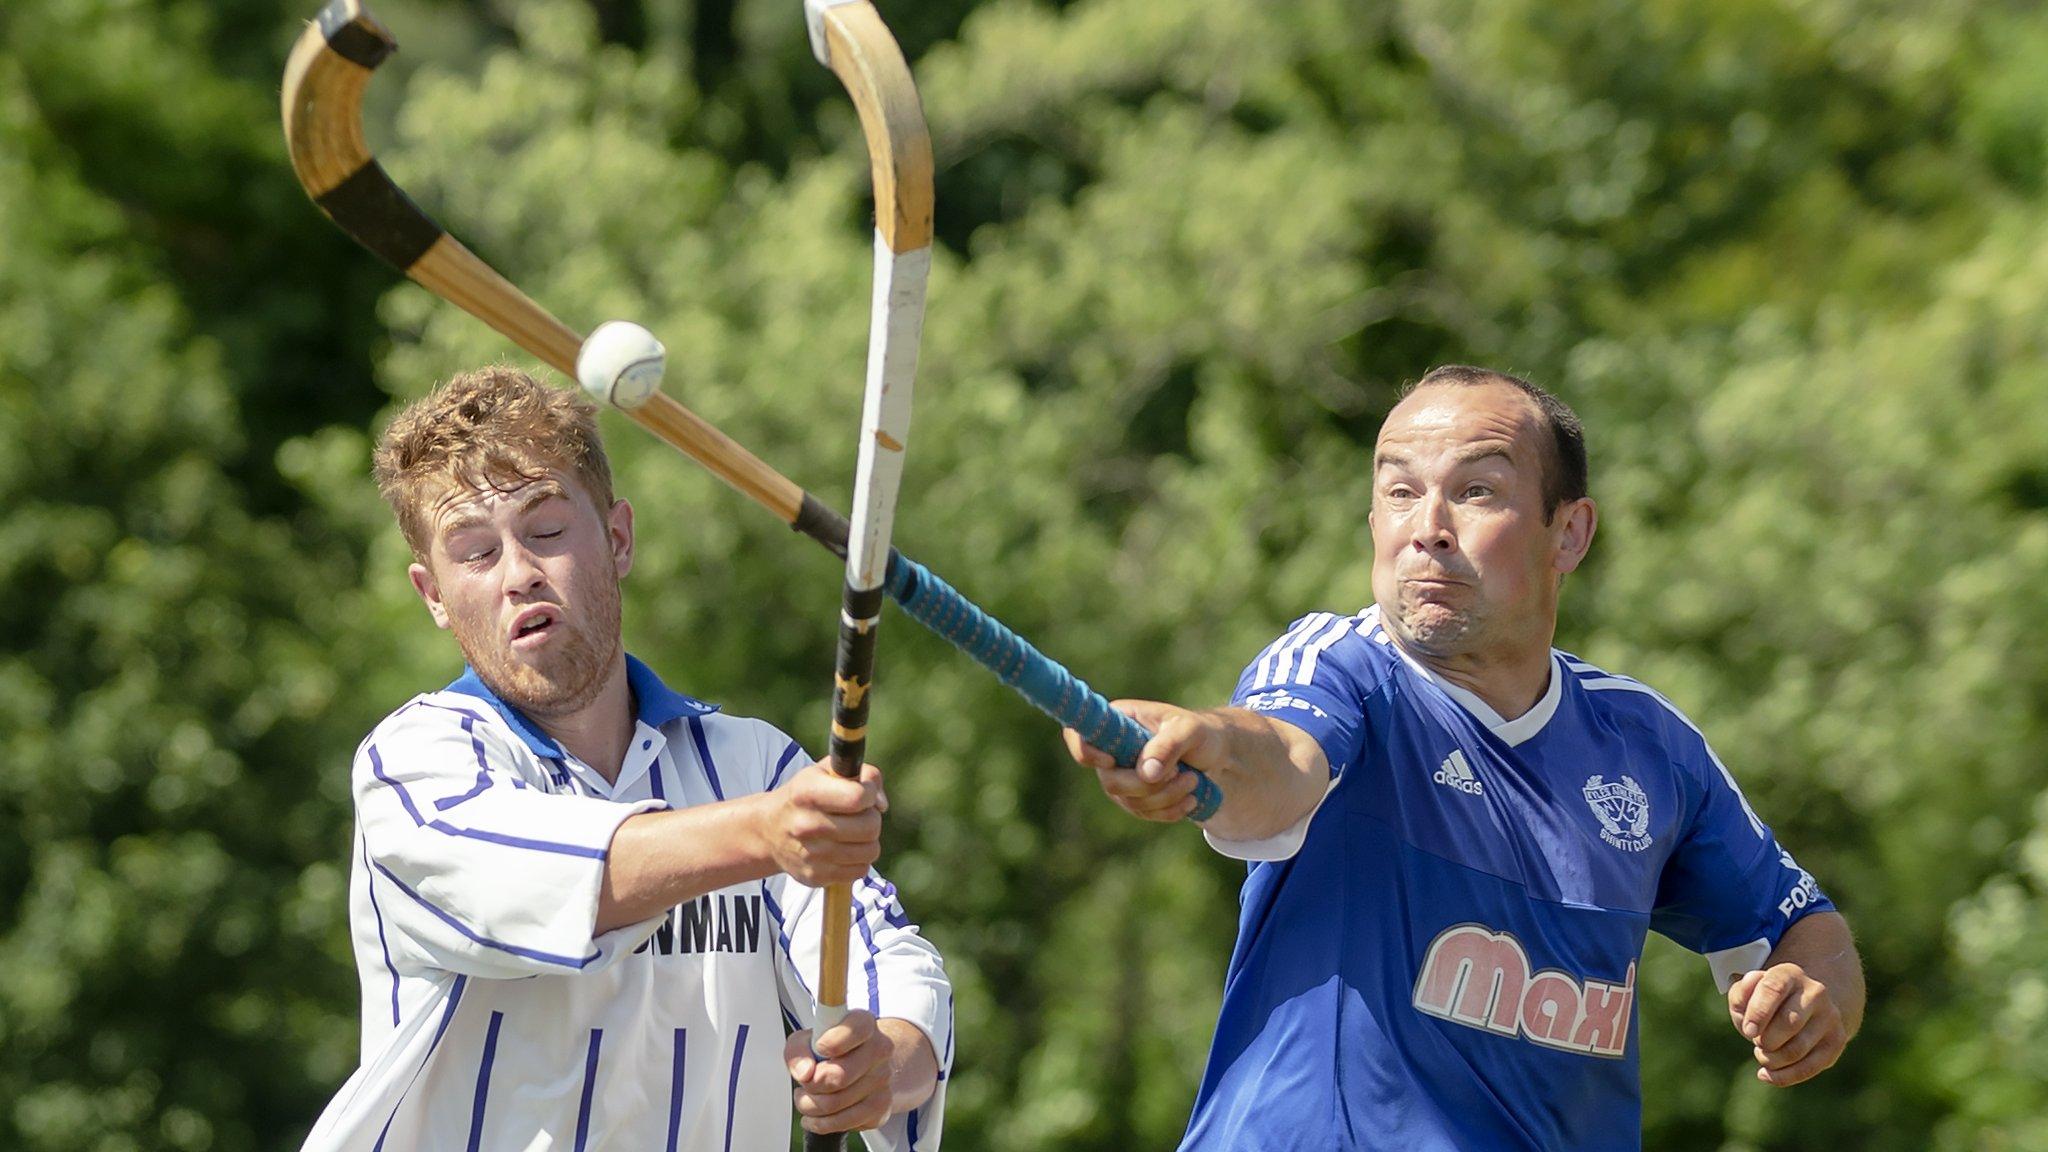 Shinty: Kilmallie stun Kyles in Camanachd Cup, Kingussie & Lovat progress